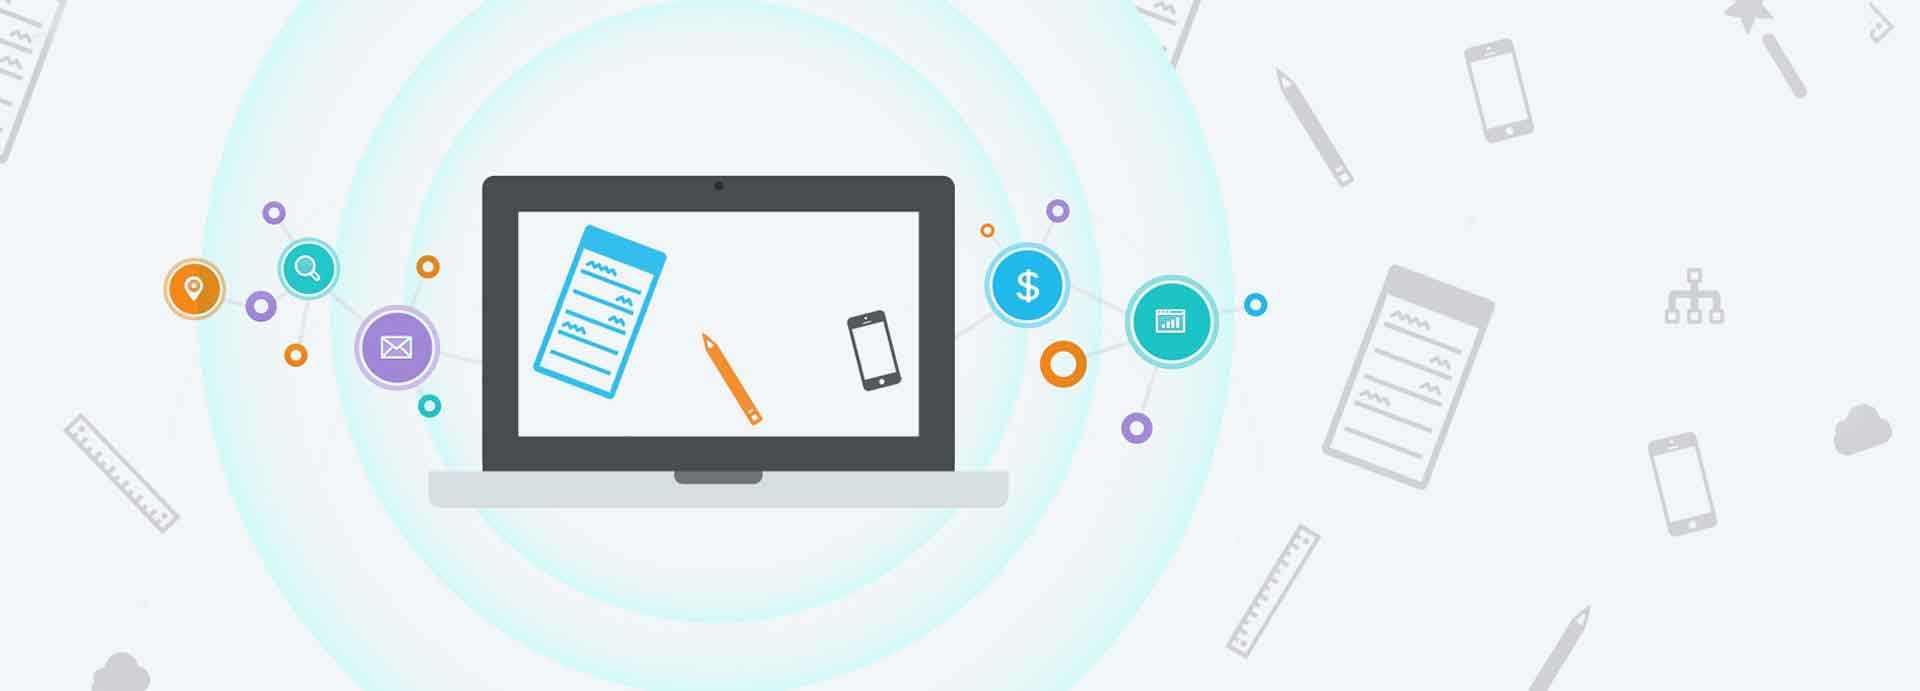 timg 1 说明企业手机网站的6项好处